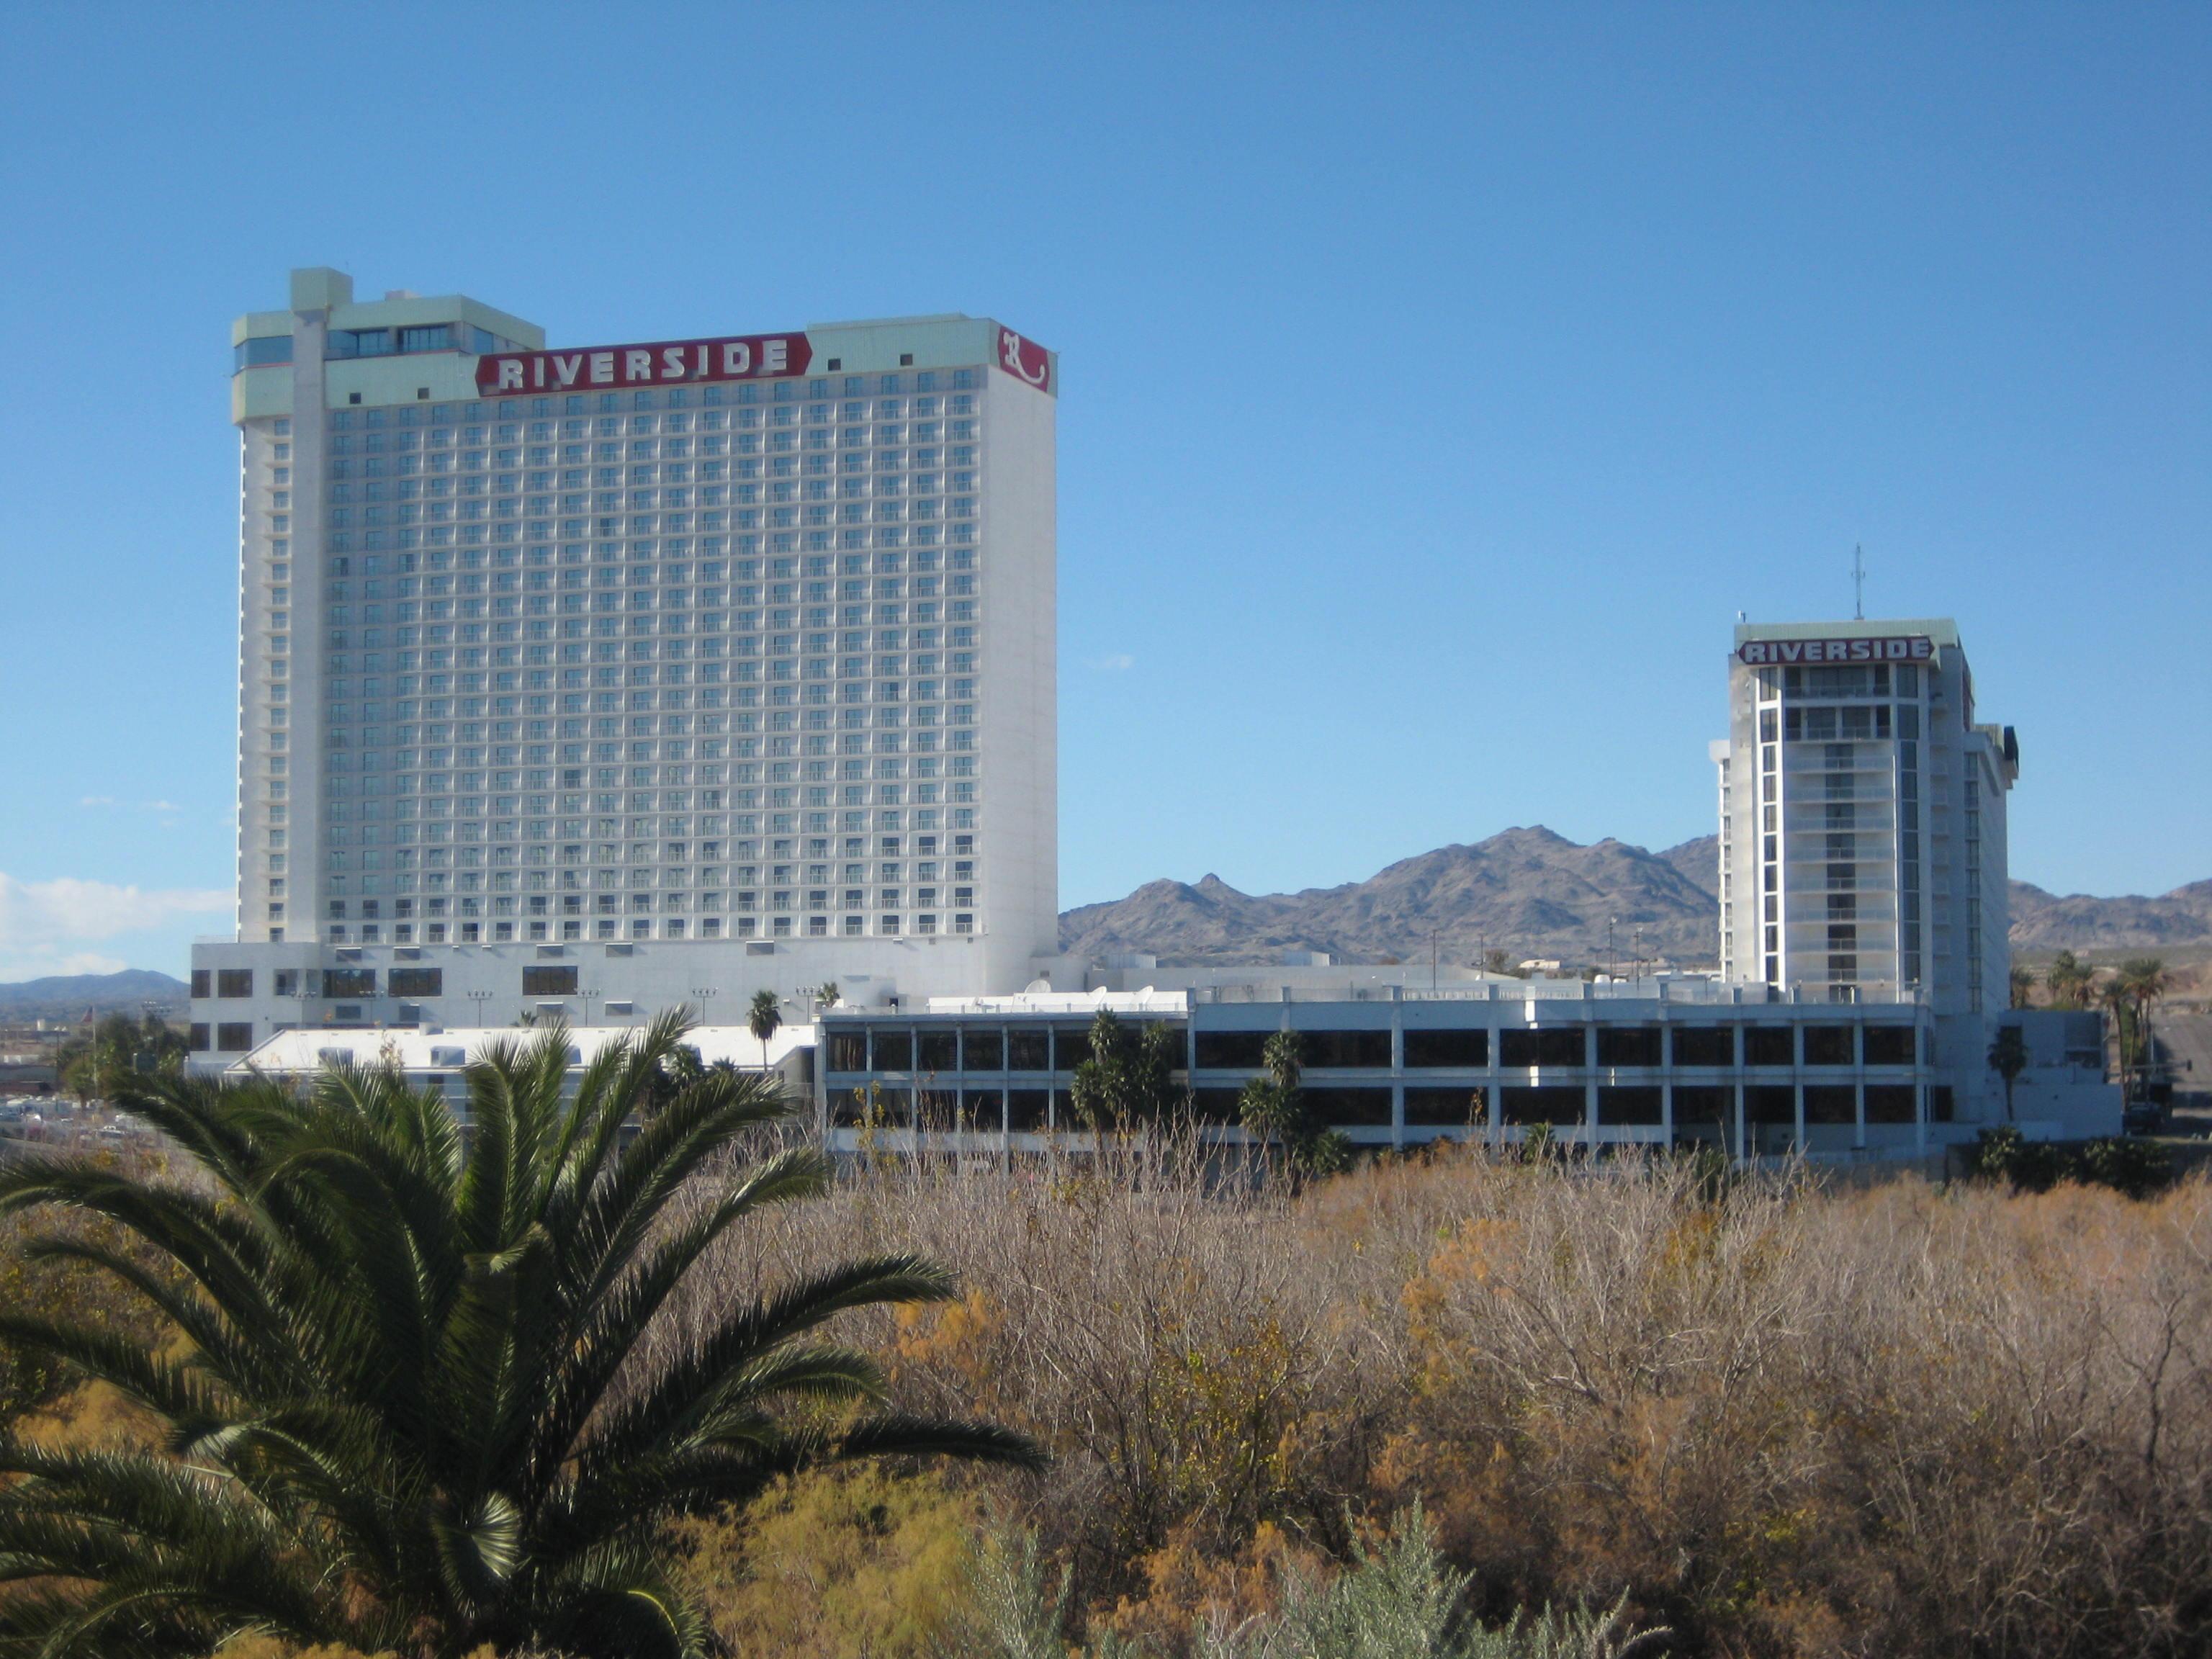 Riverside Casino Coupons